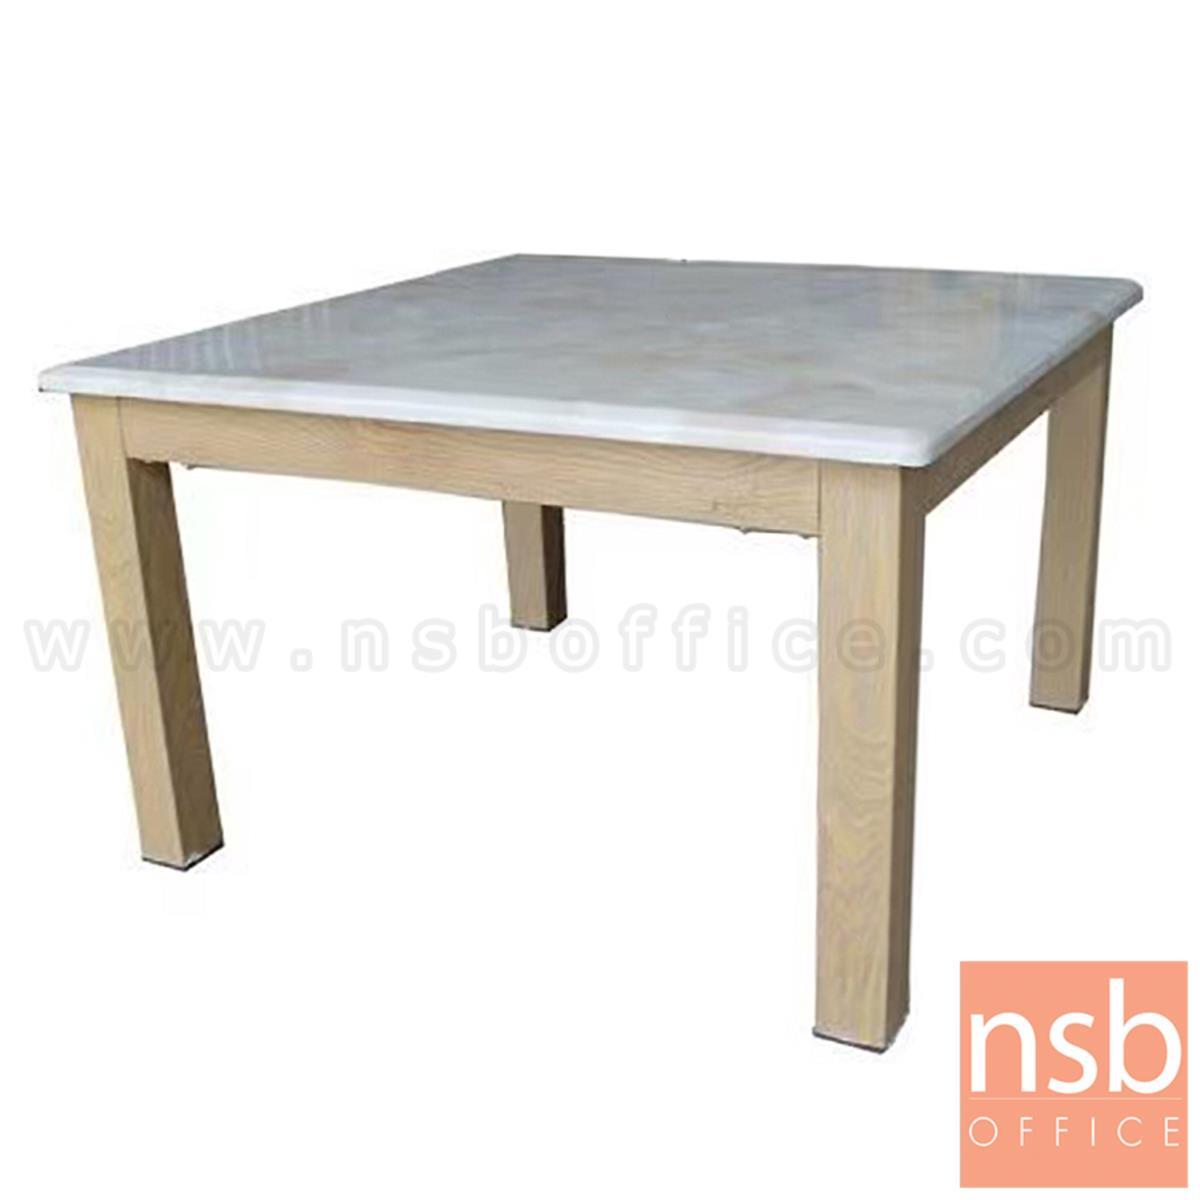 B13A296:โต๊ะกลางหินอ่อน รุ่น Converse (คอนเวิร์ส) ขนาด 70W cm. ขาเหล็ก